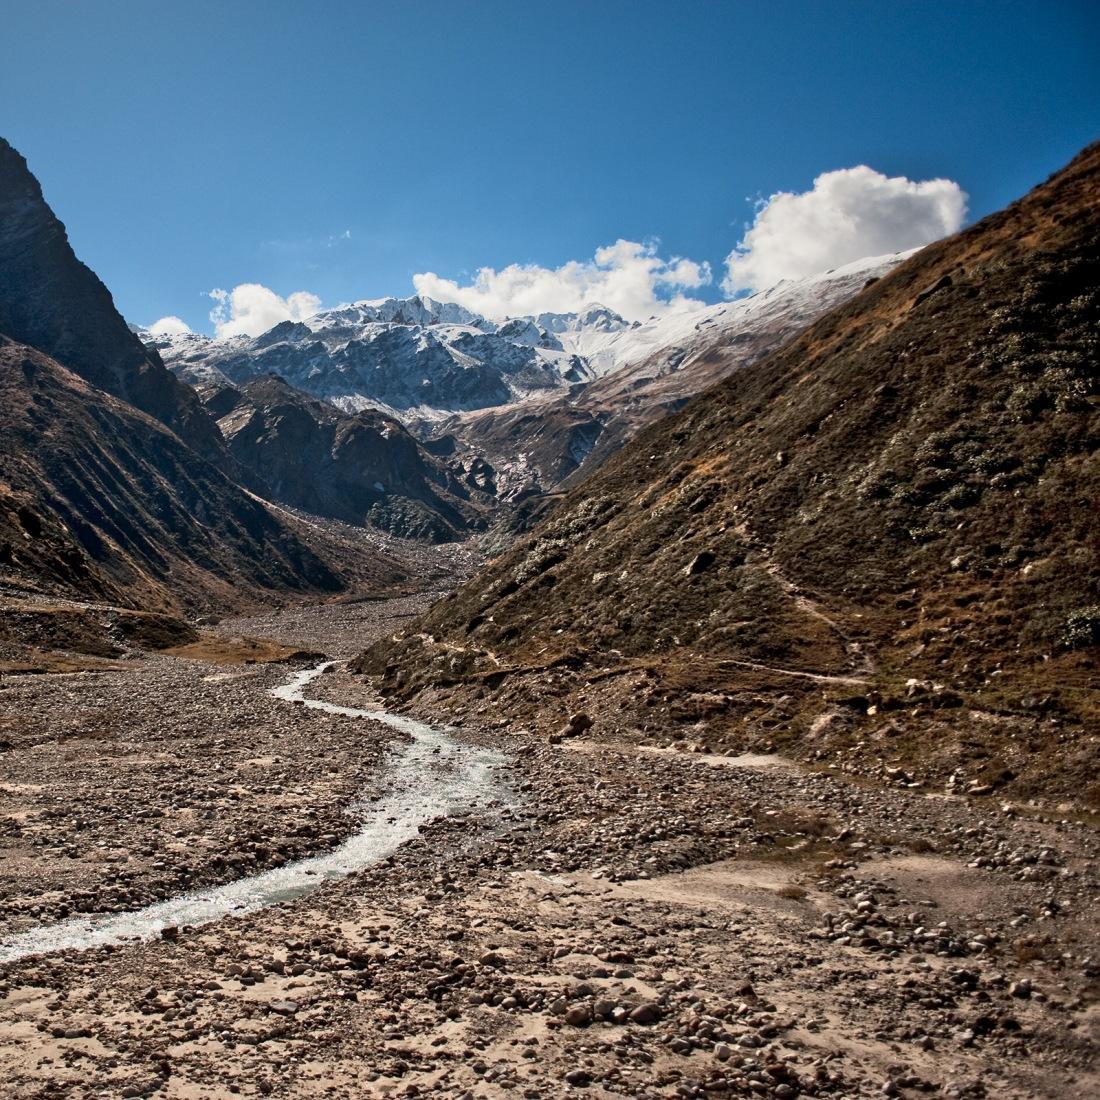 From the campsite at Chauki, Uttarakhand, India. Trek Day 20